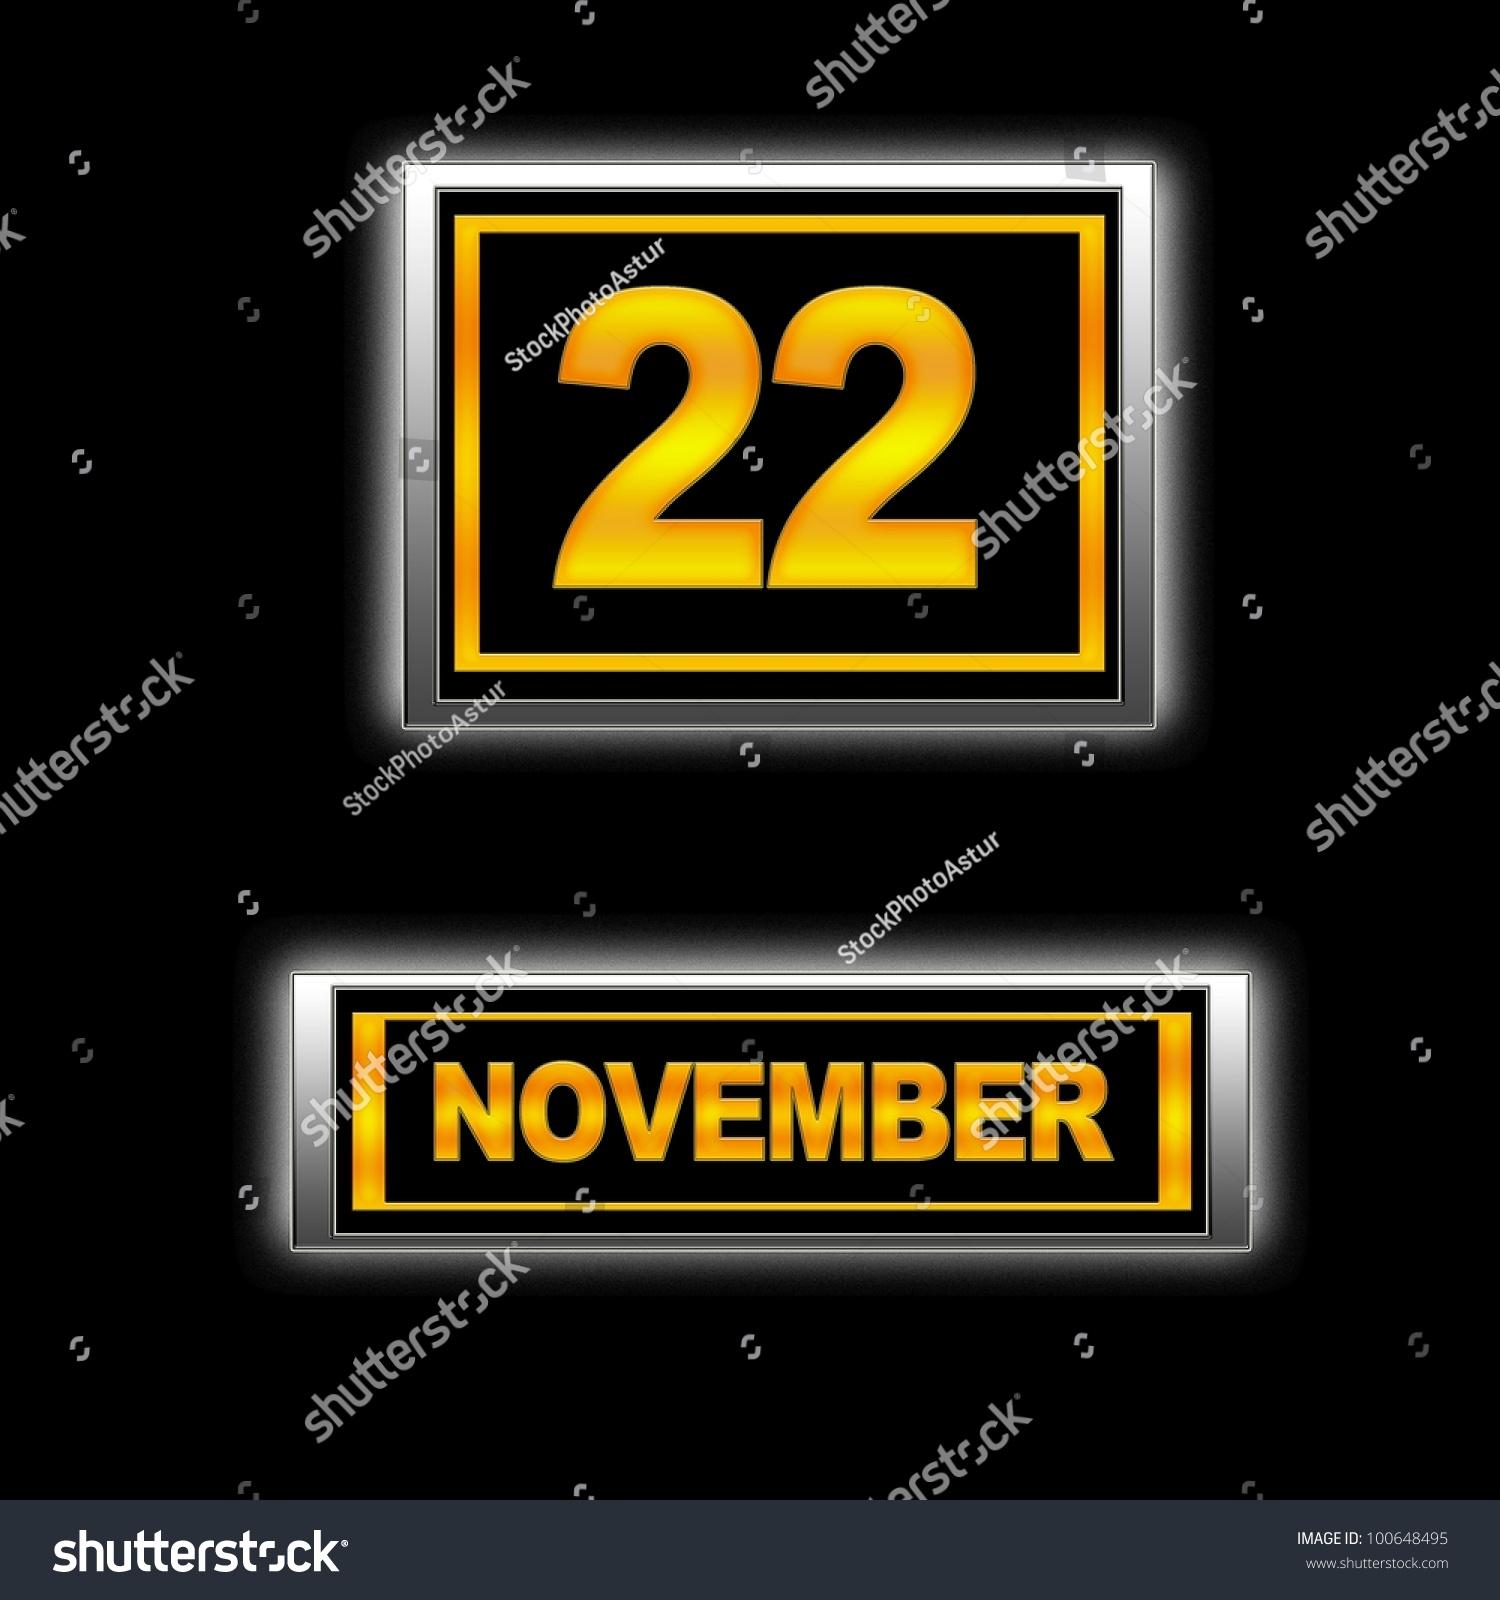 Calendar Illustration Search : Illustration with calendar november